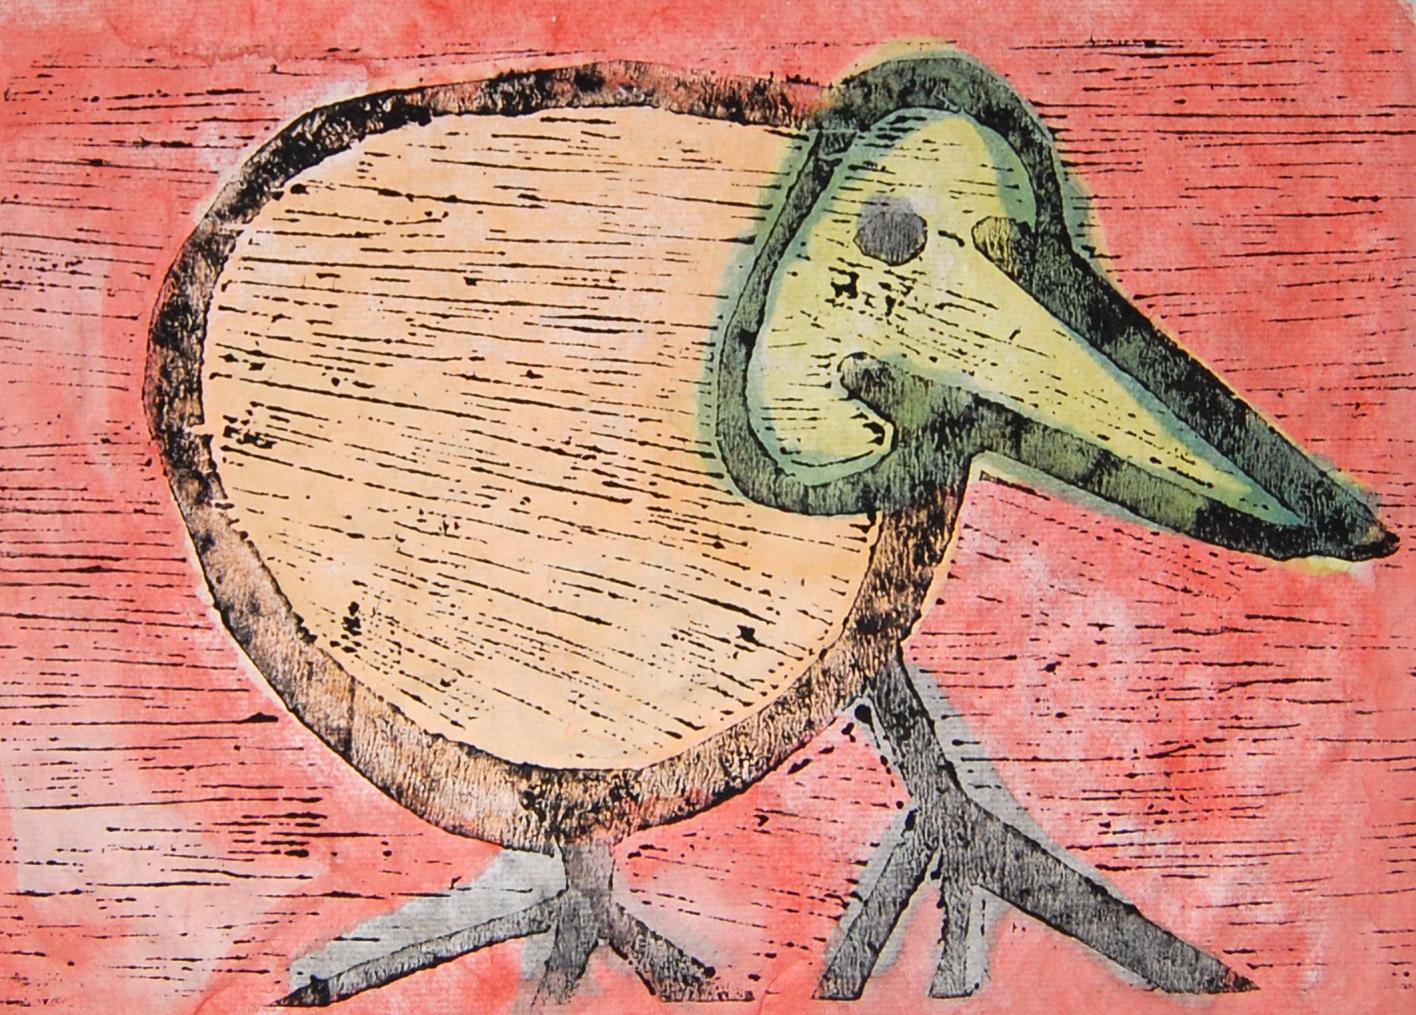 Untitled (37) - Kiwi Bird Woodcut with hand colouring 25x16cm